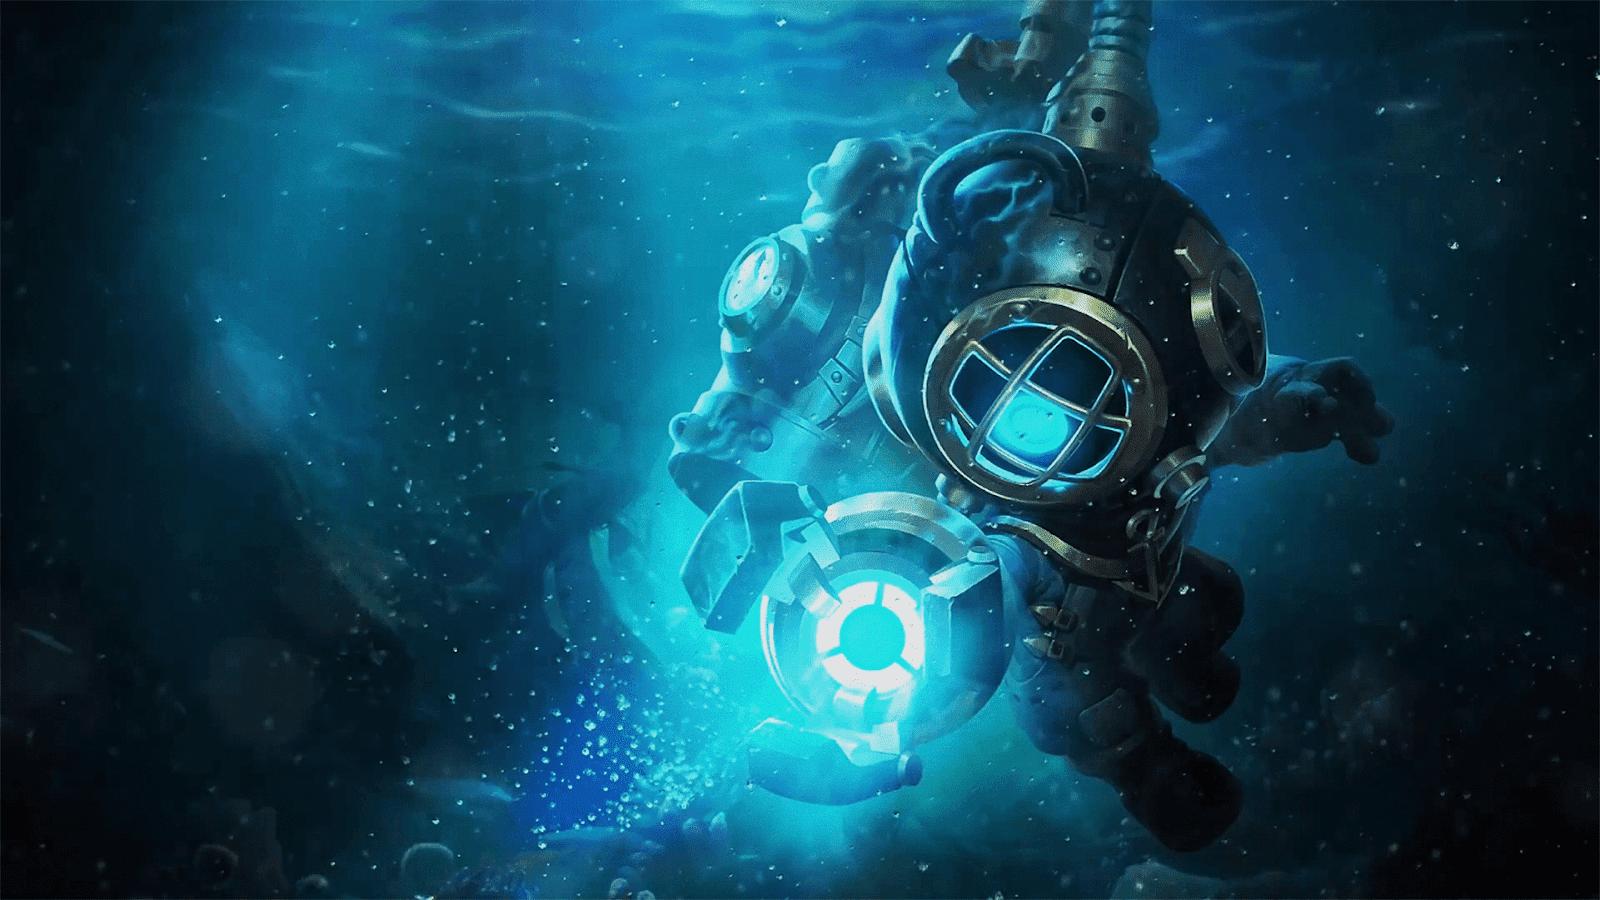 Wallpaper Cyclops Deep Sea Rescue Skin Mobile Legends HD for PC